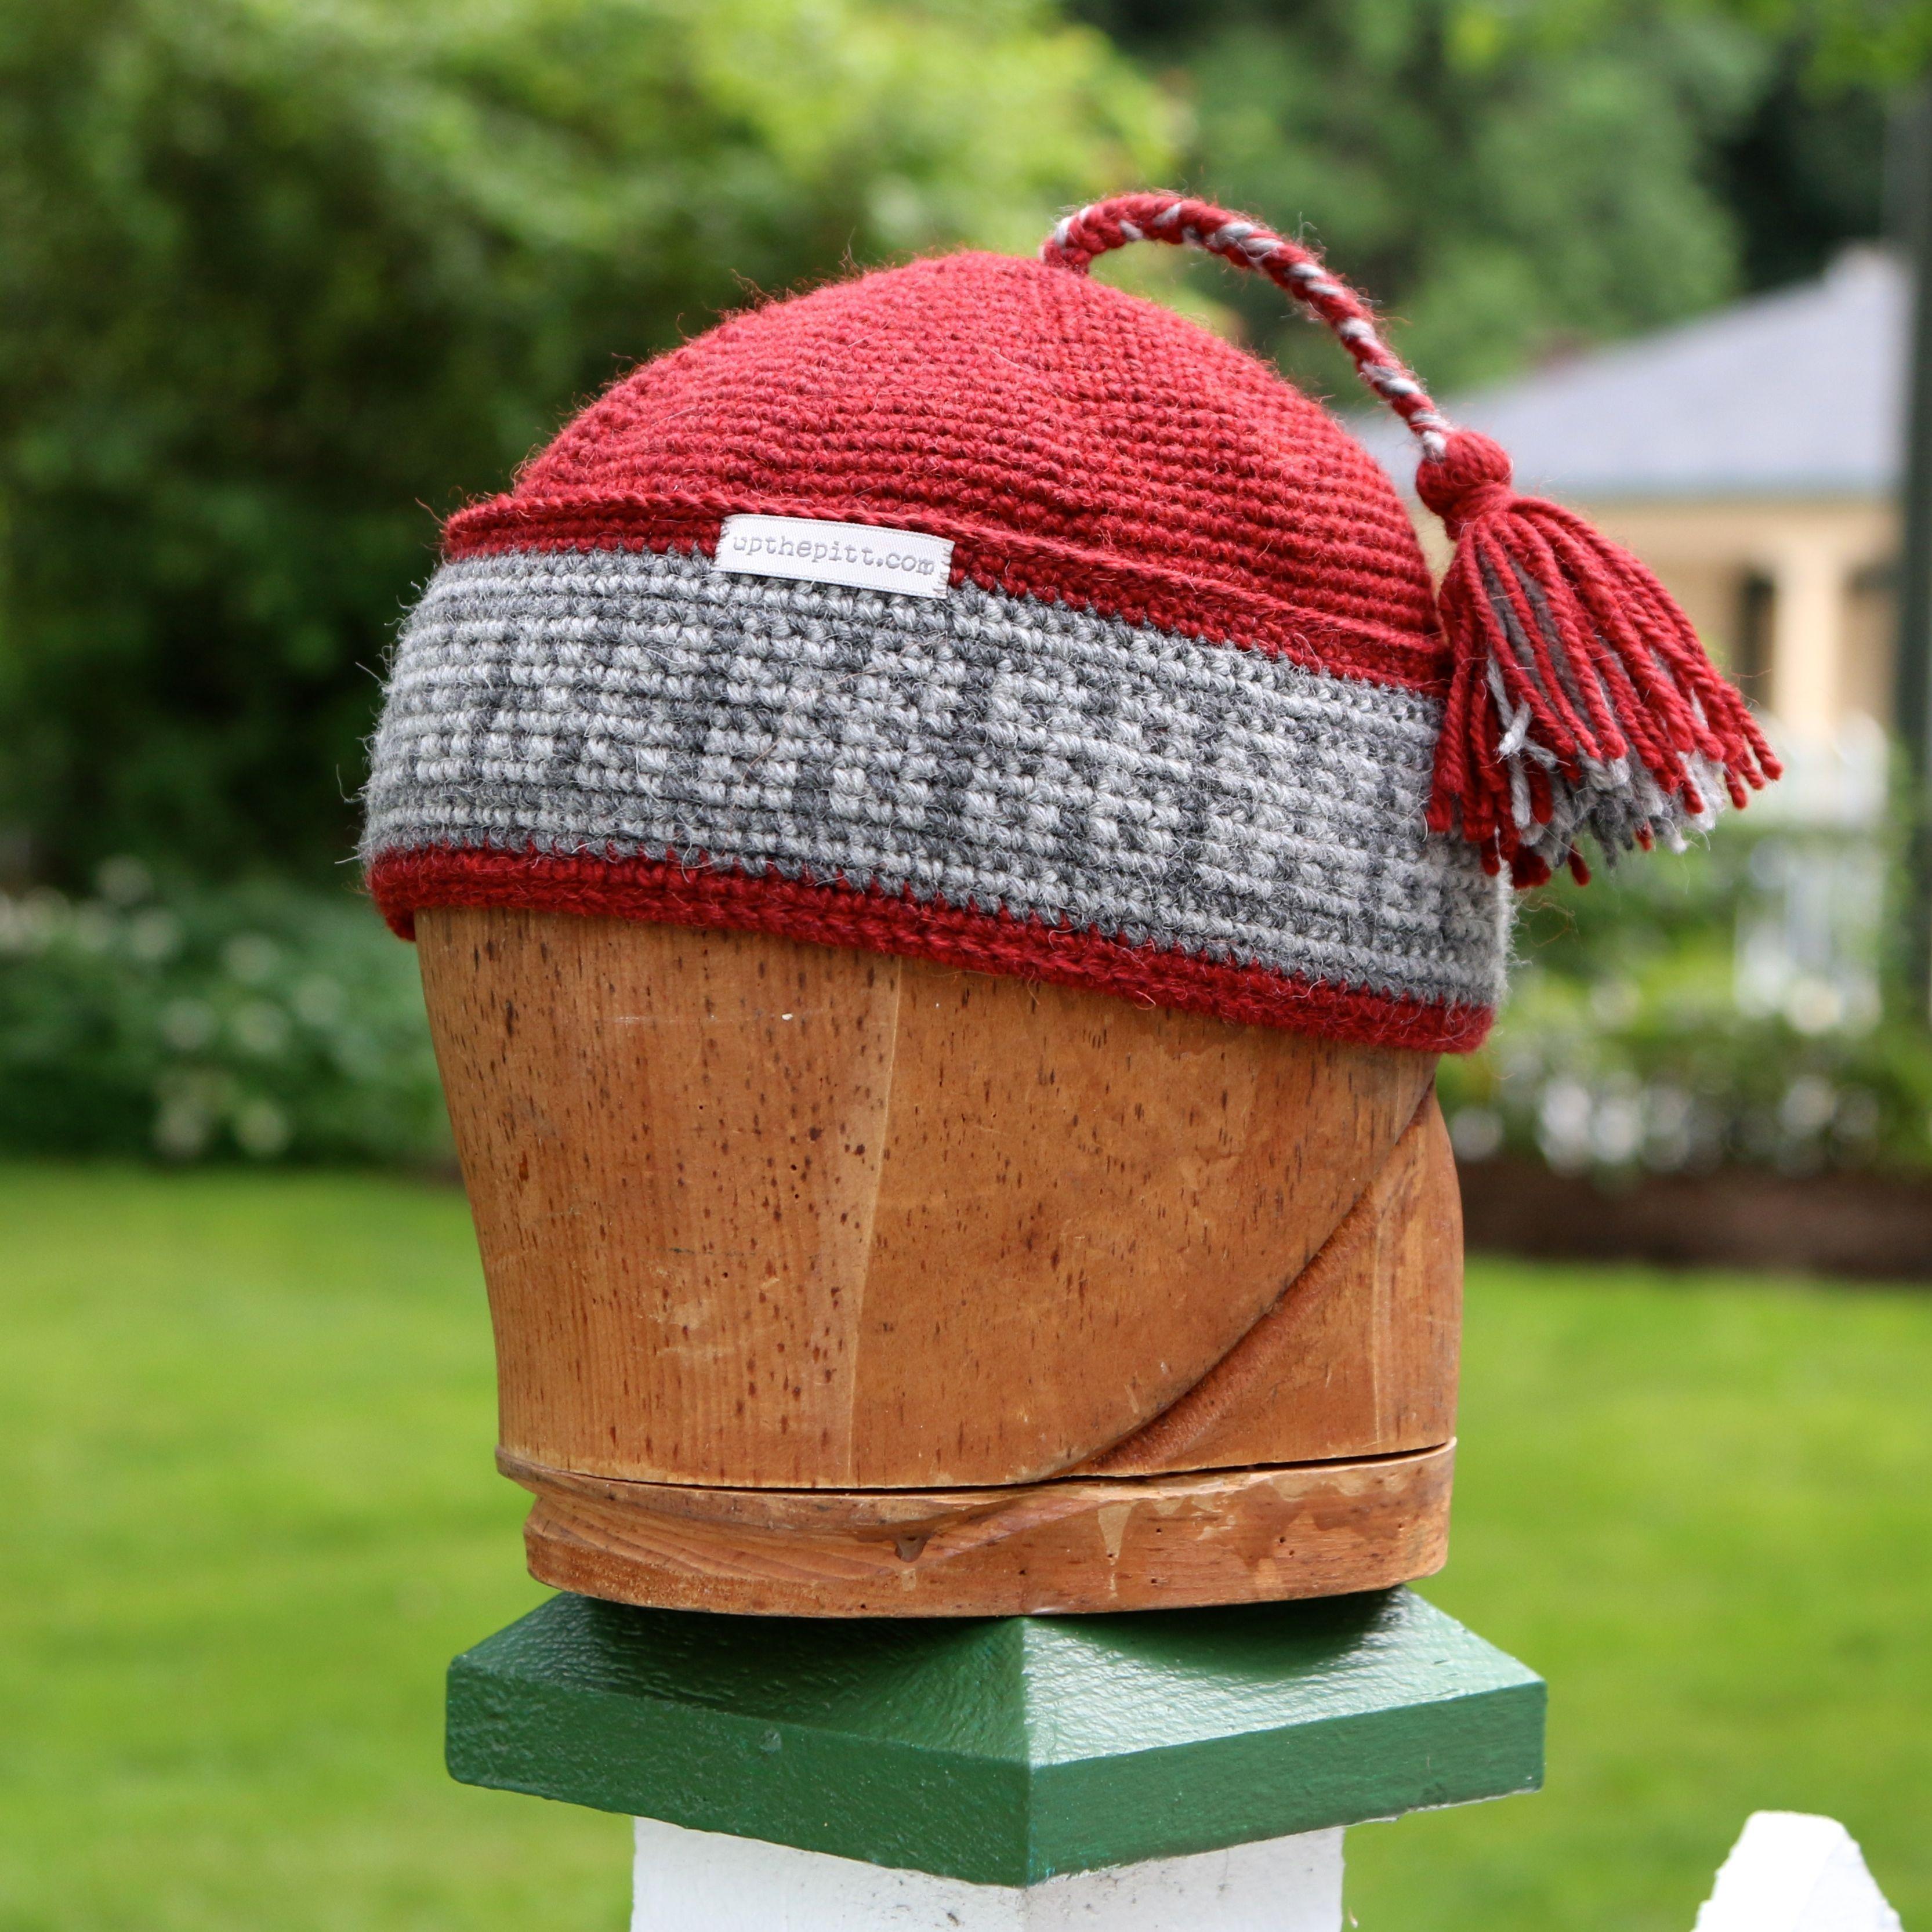 Tapestry crochet Pang hat, crochet beanie | atki bere | Pinterest ...